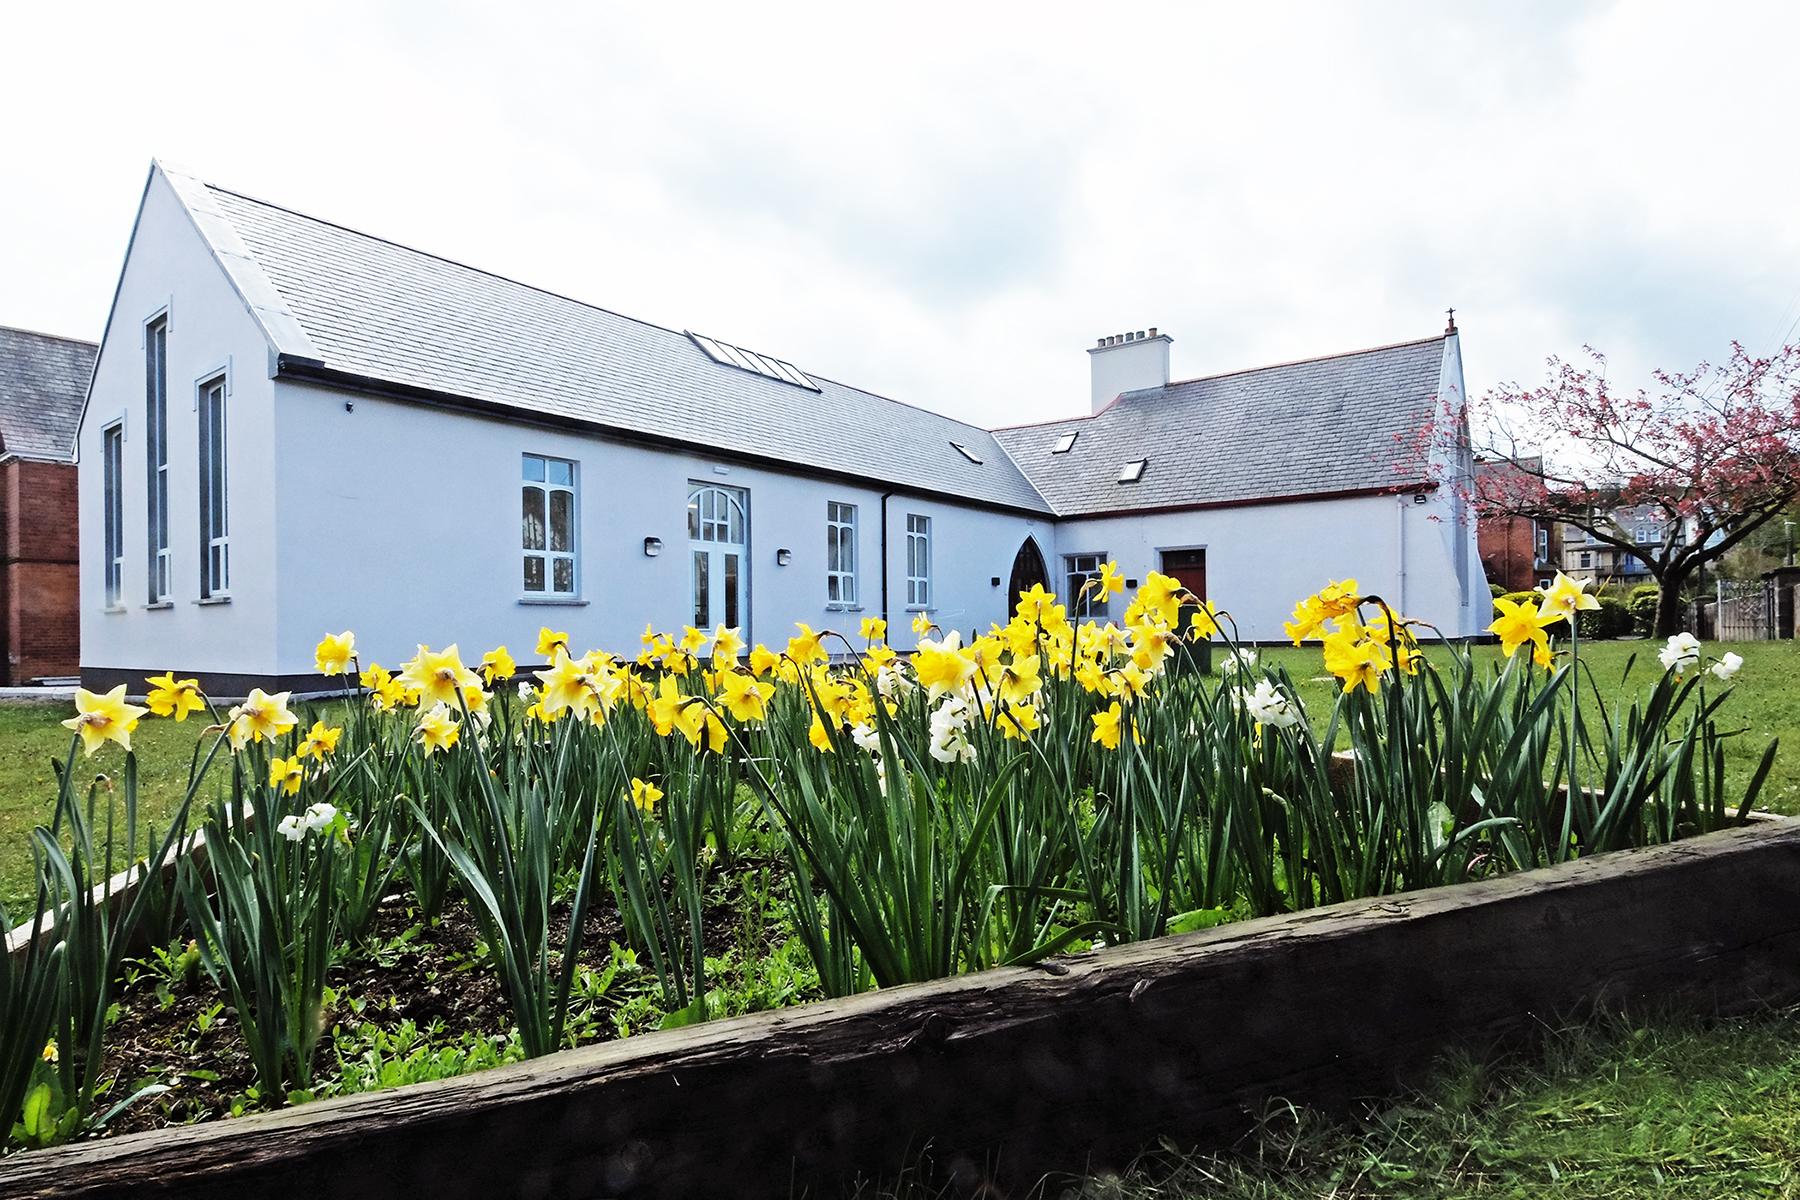 County Antrim, WHITEHEAD, Whitehead Methodist Church (Stanley Gilpin)